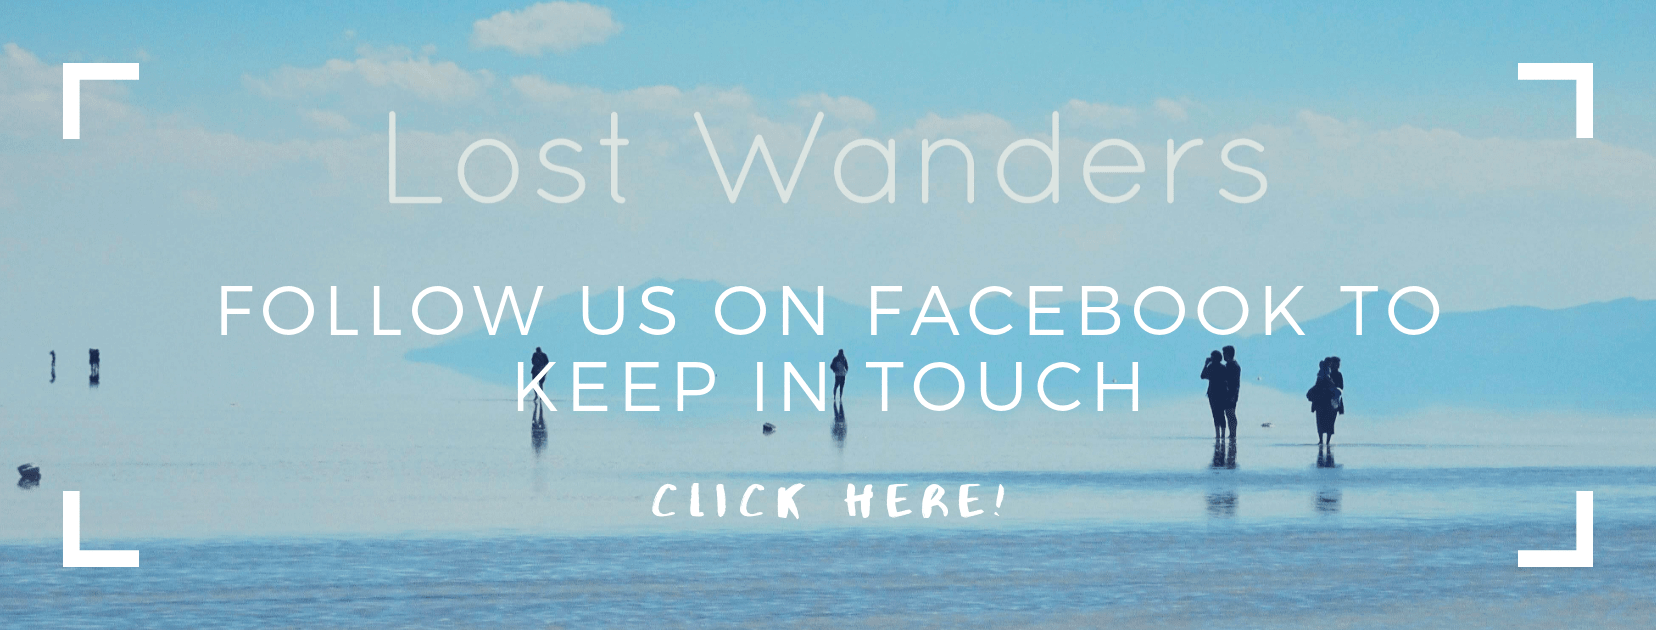 Lost Wanders Facebook link